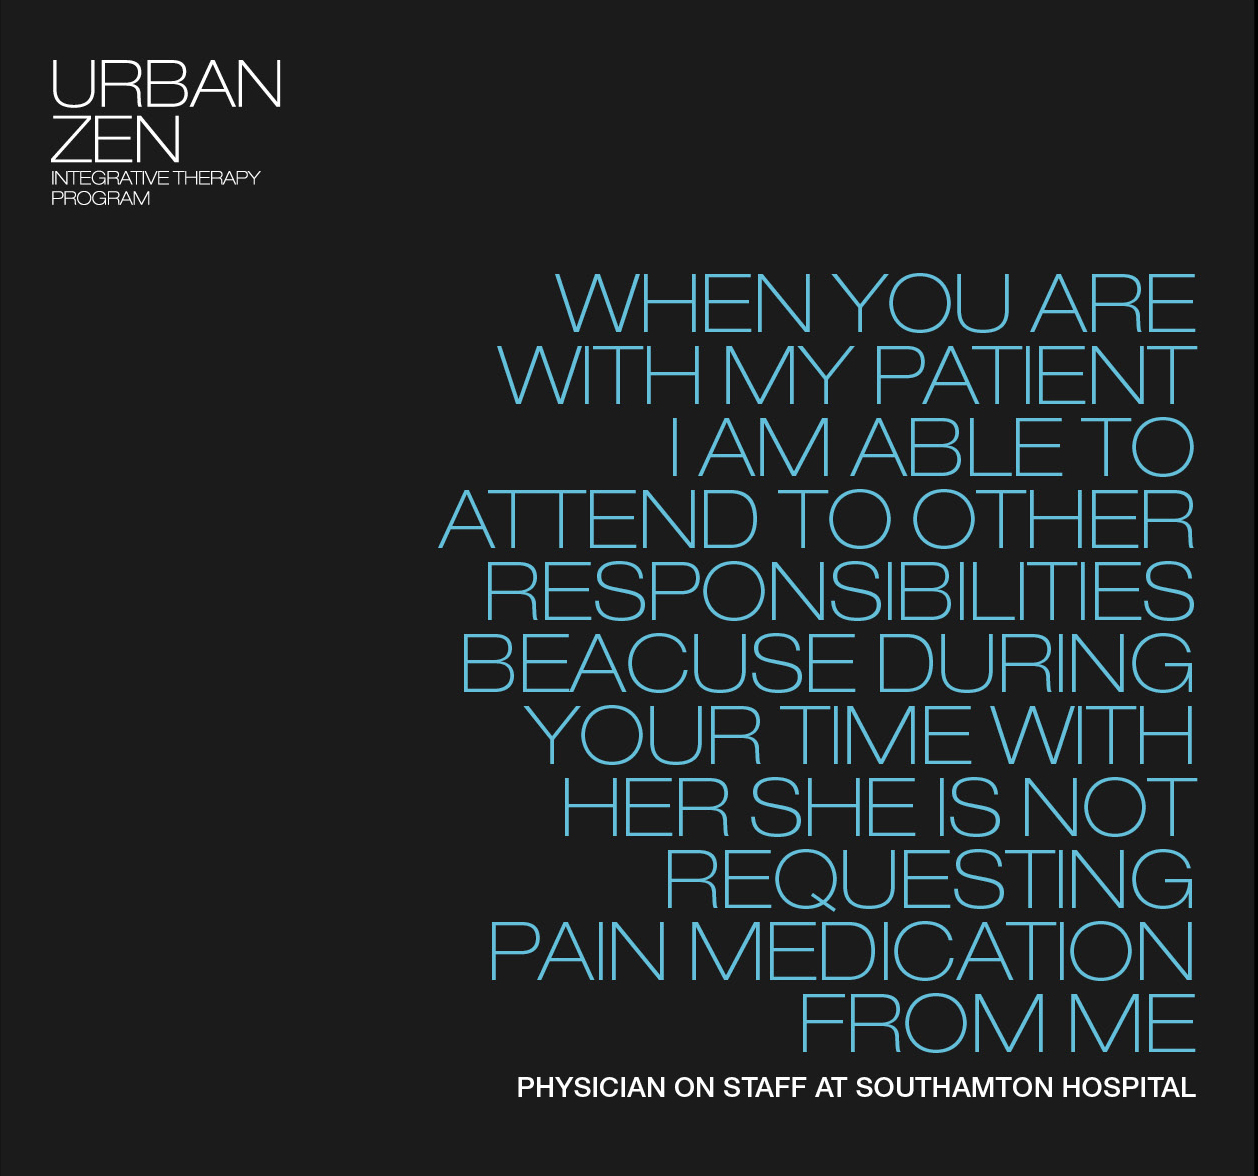 UZIT-patient-testimonial20jpg_03